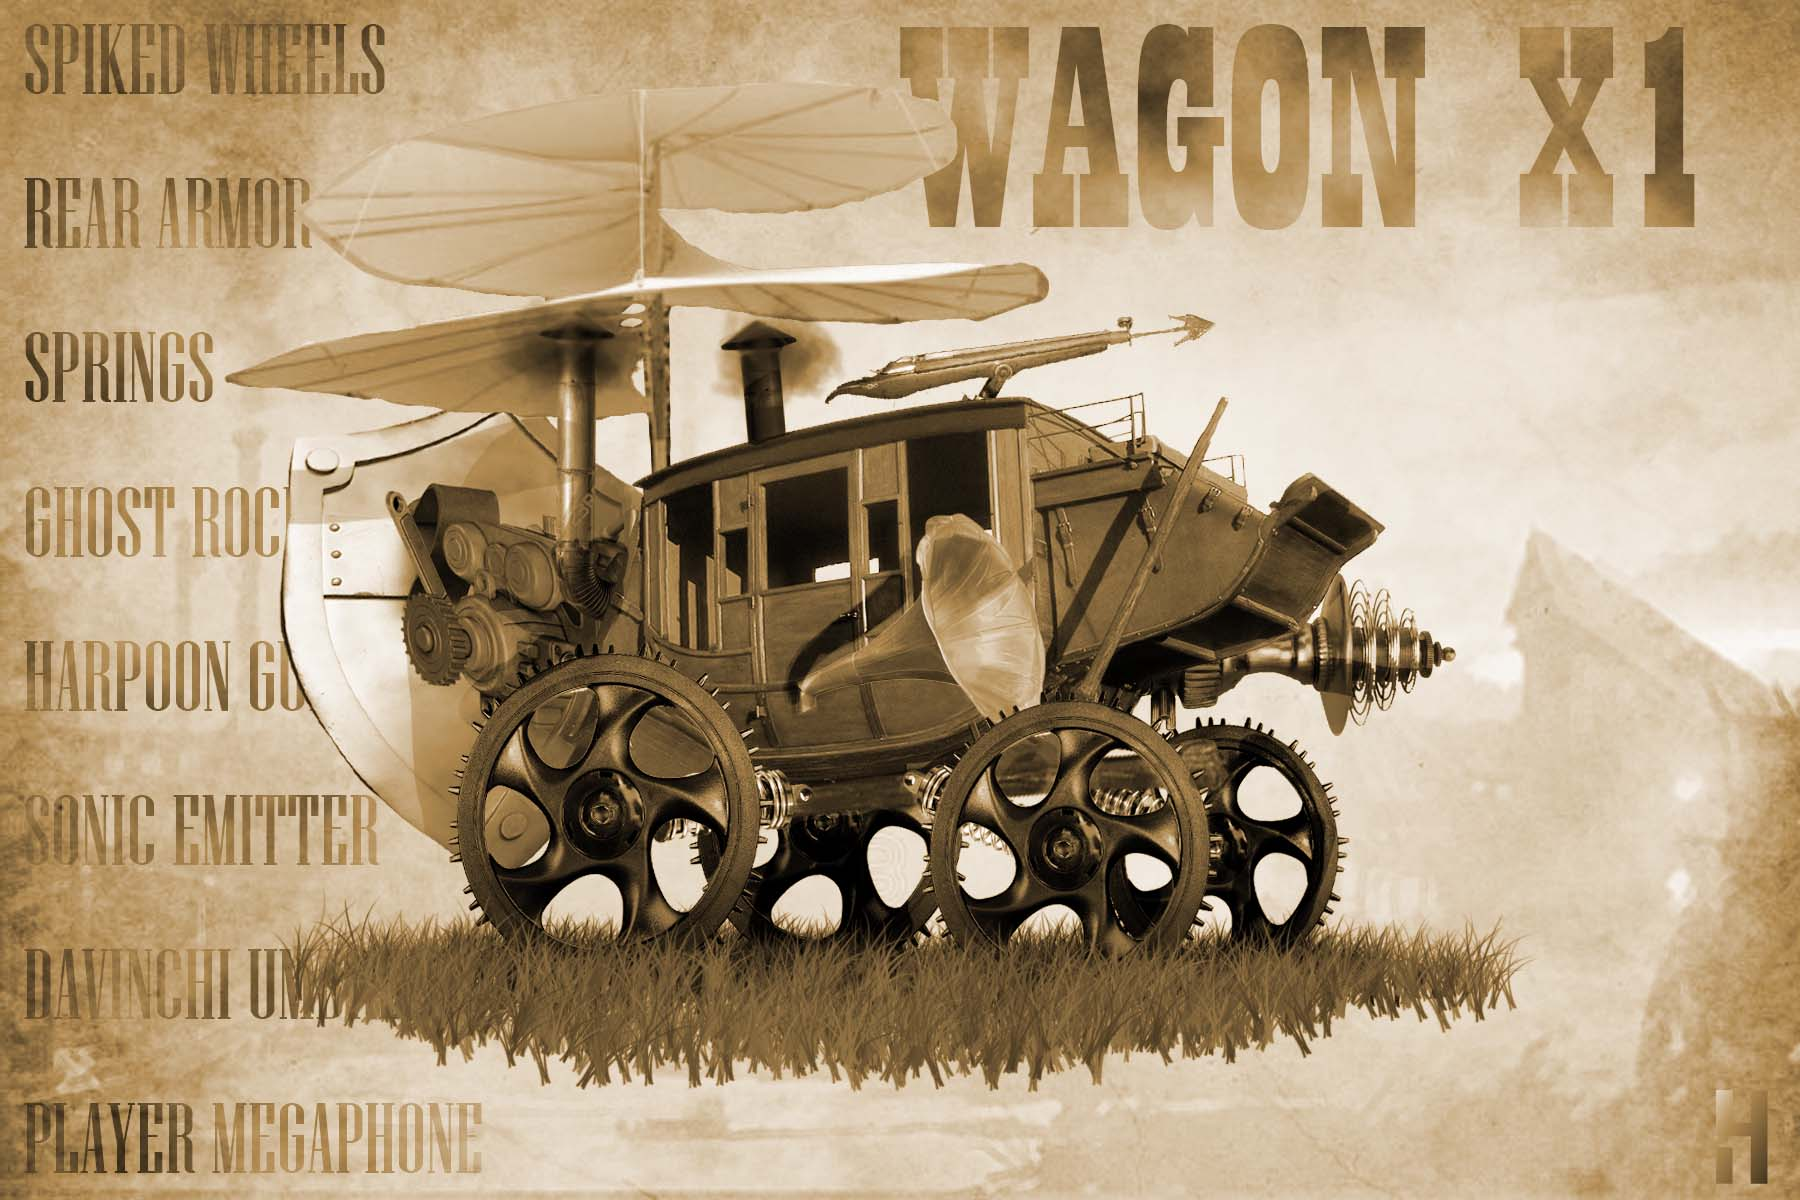 WagonX1